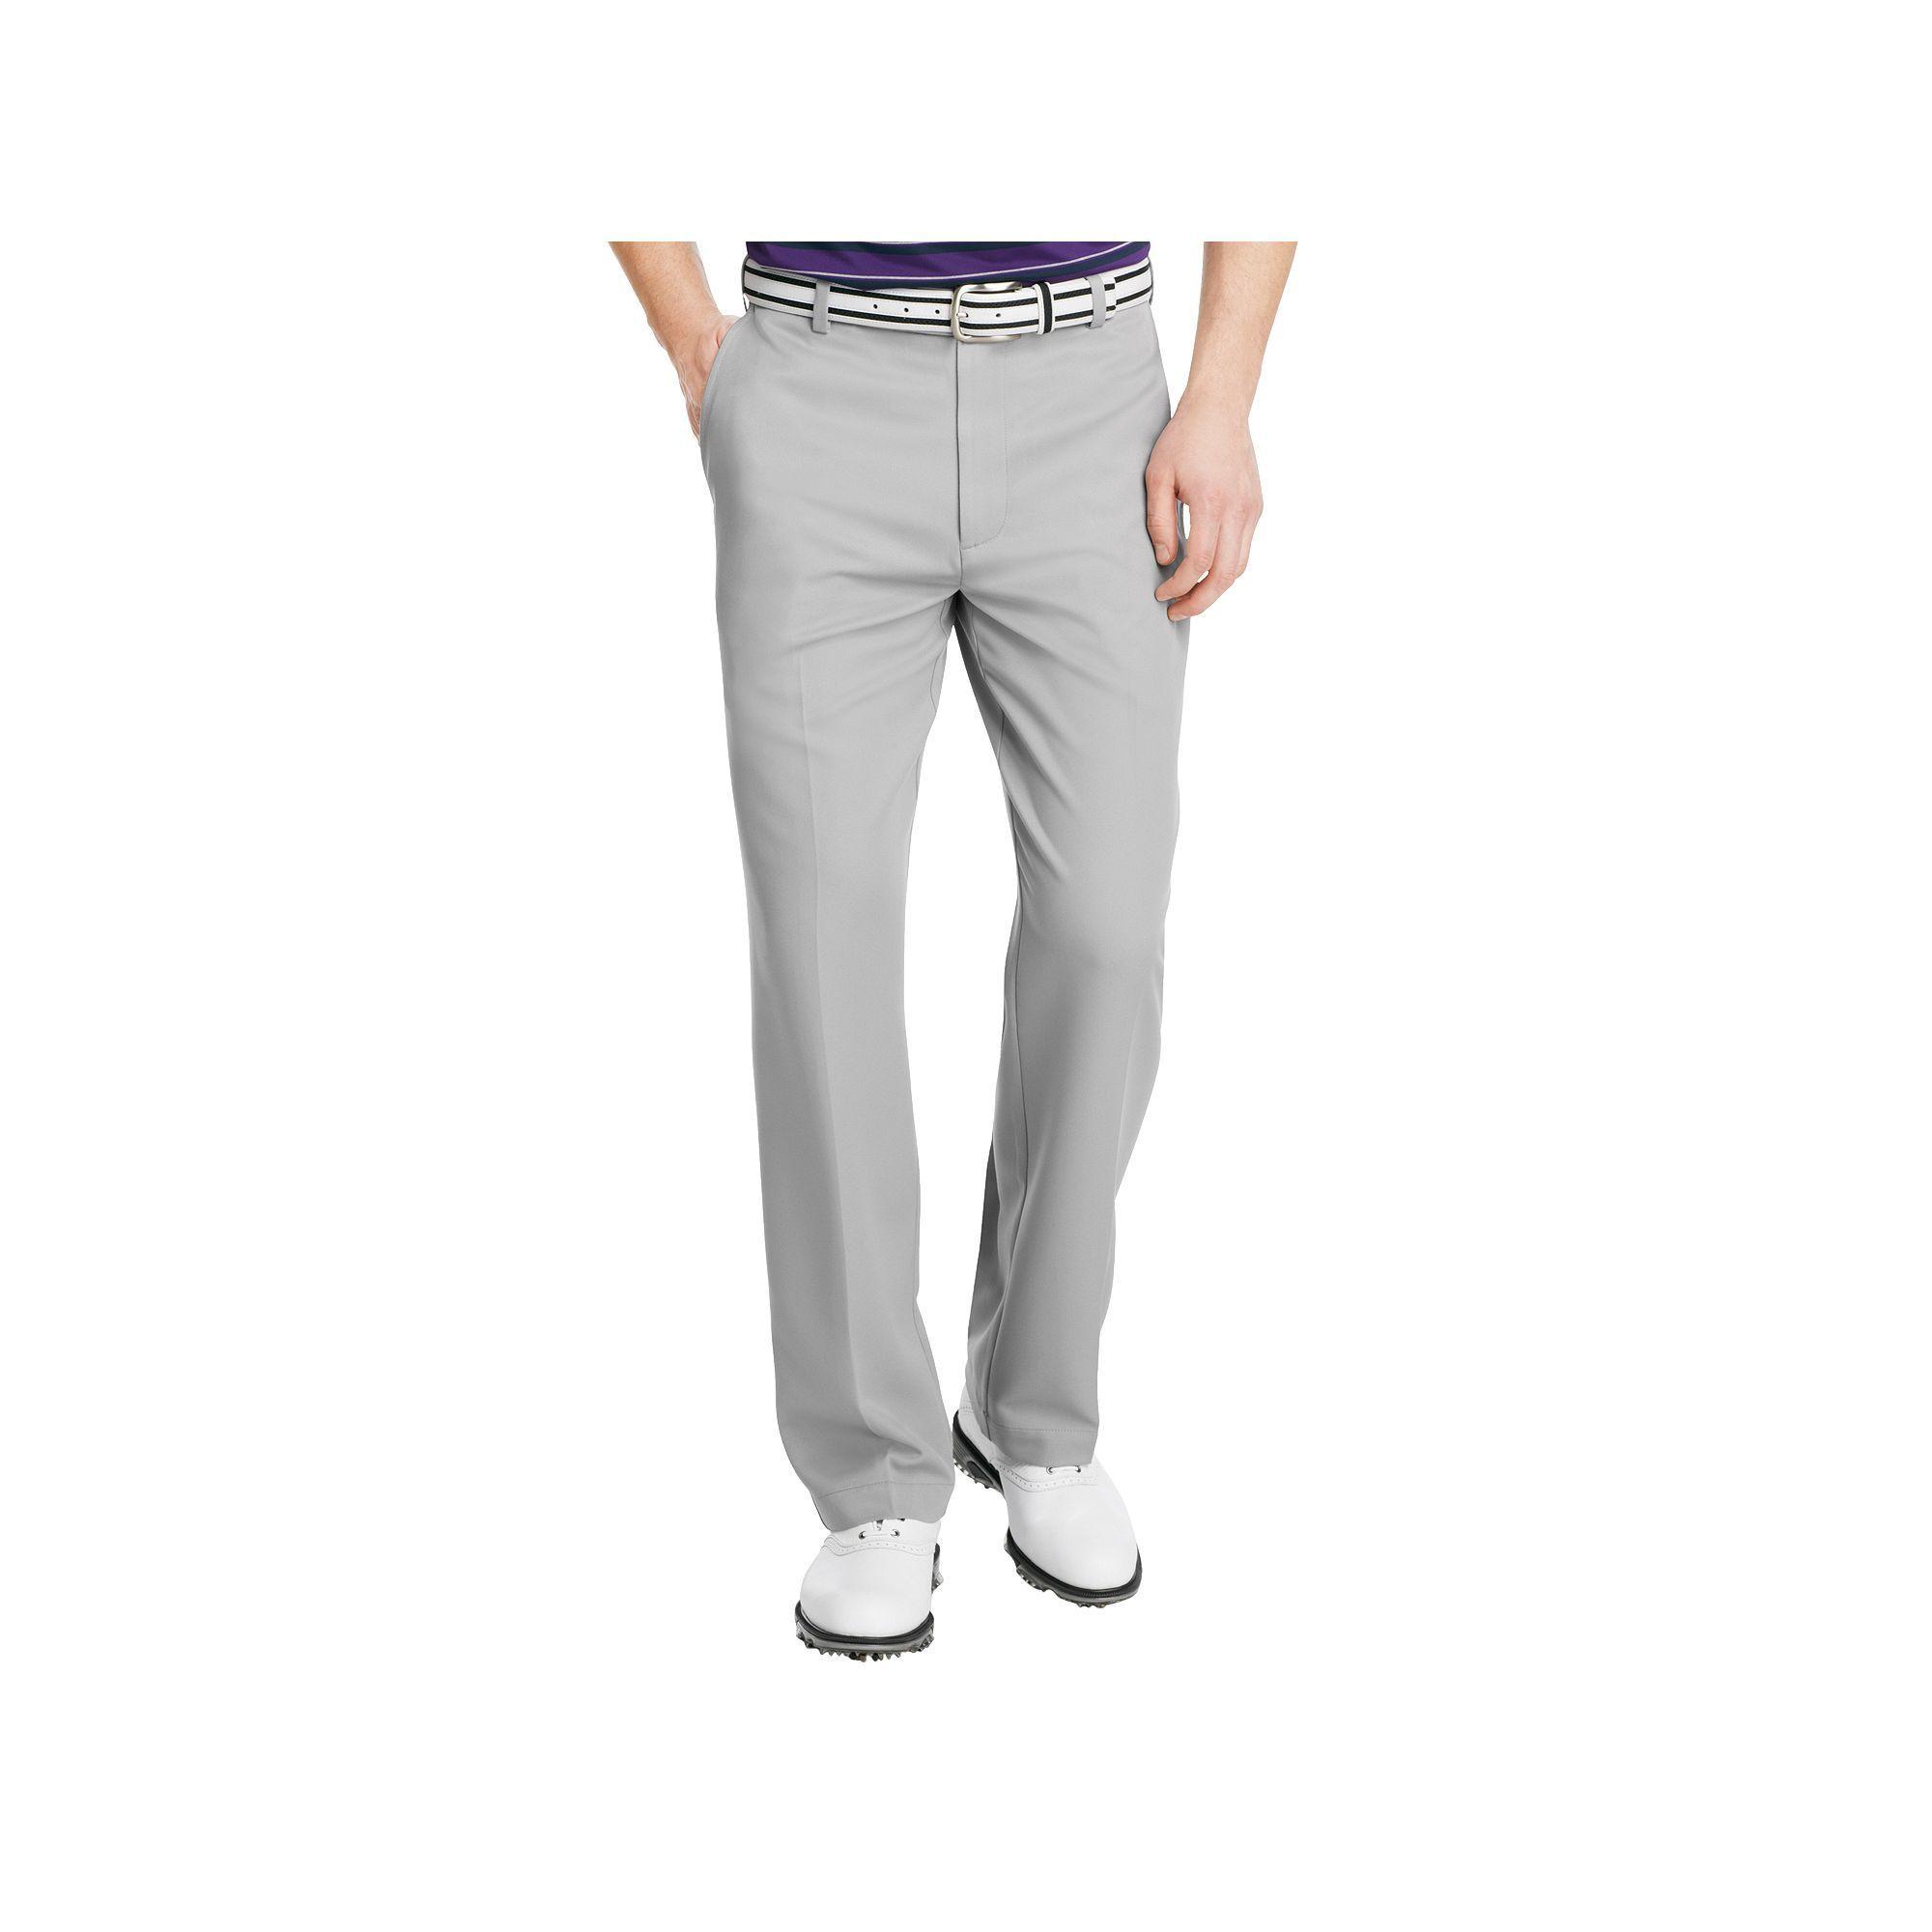 8e911b14b6 Men's IZOD XFG Microsanded Microfiber Performance Golf Pants, Size: 44X30,  Dark Grey